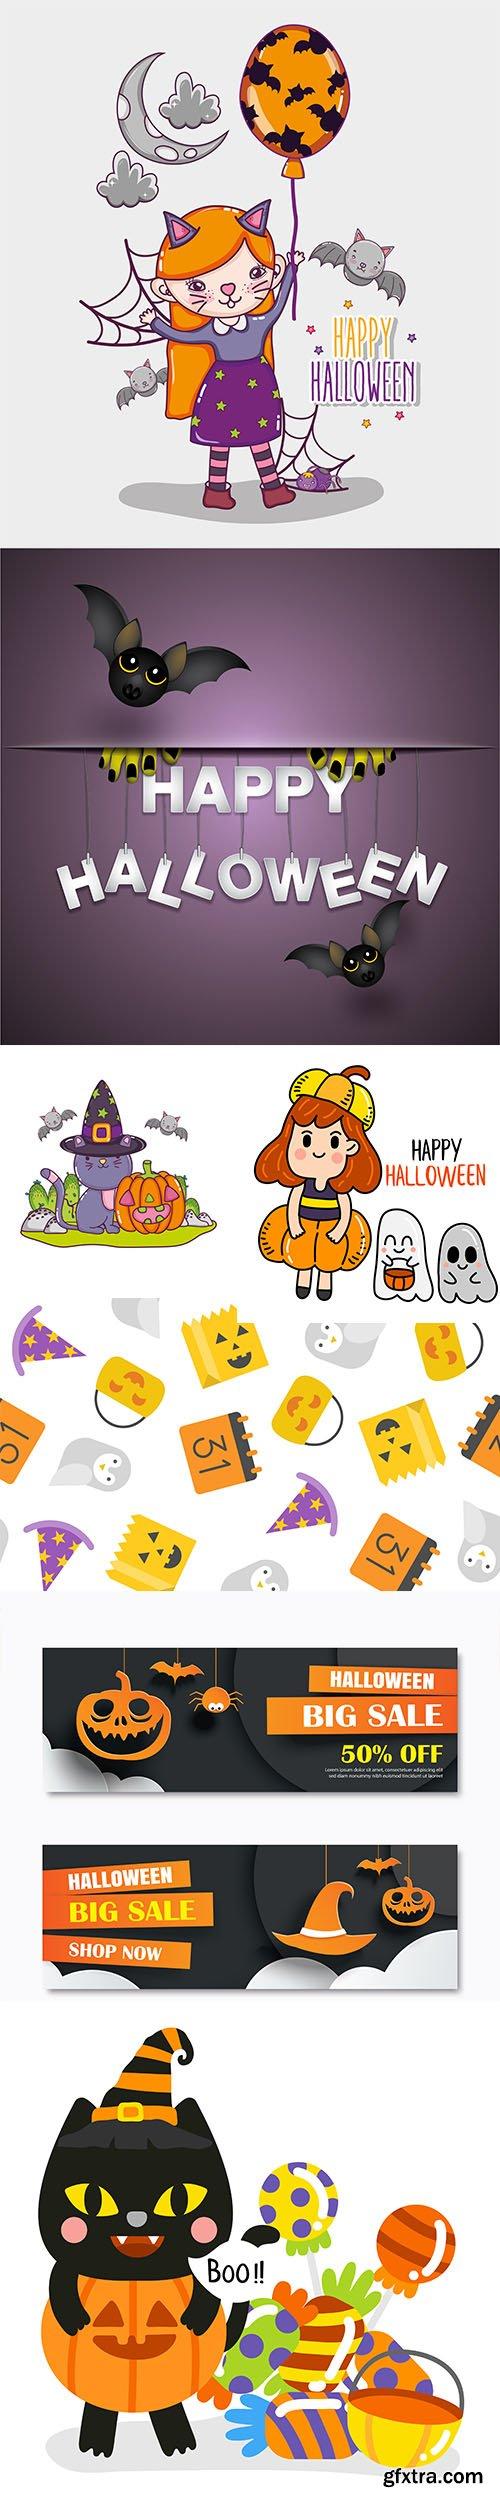 Happy Halloween Illustration Set +Bonus Social Banner and Halloween Pattern